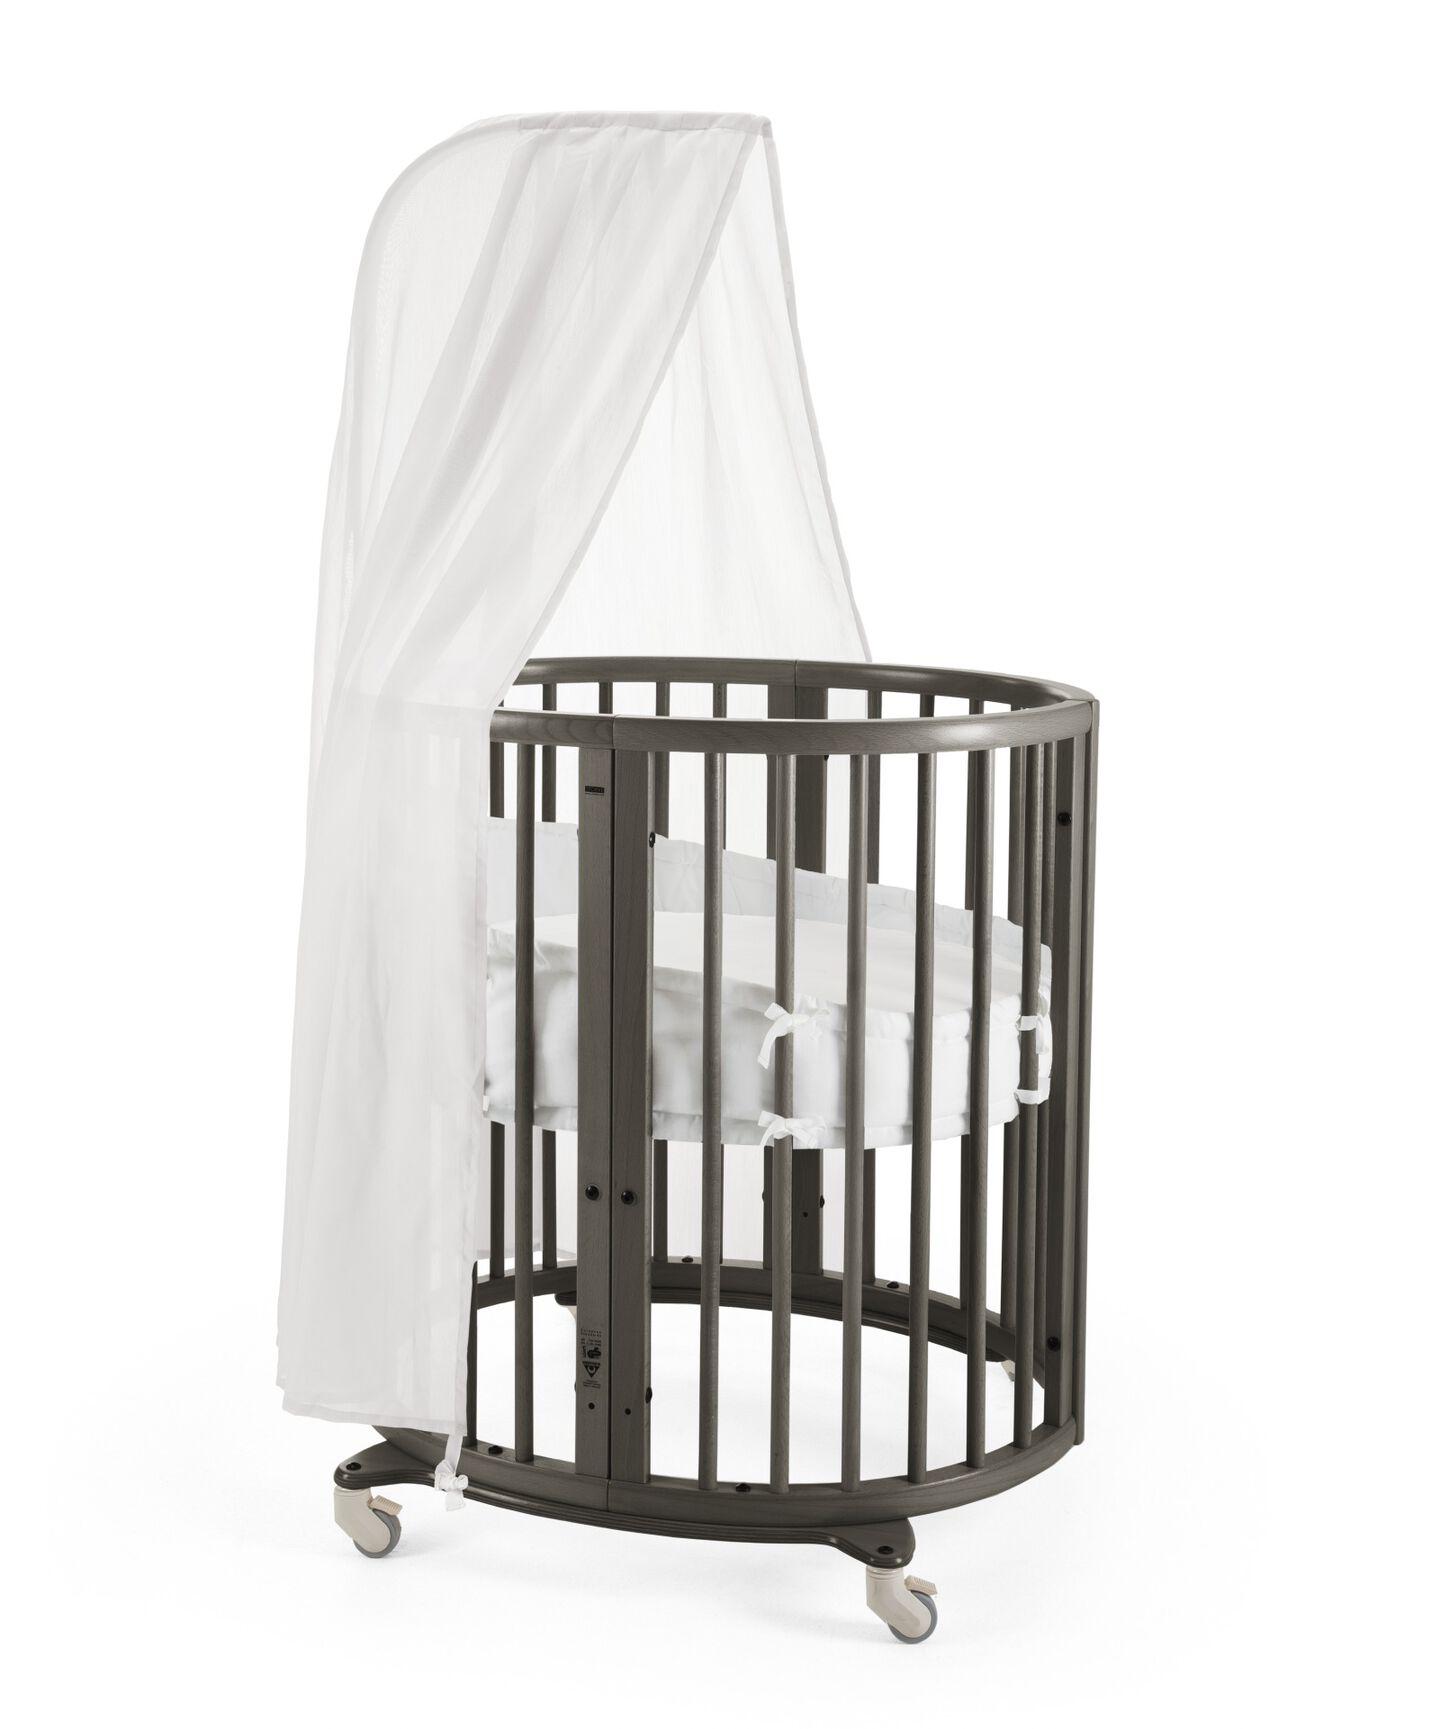 Stokke® Sleepi Mini, Hazy Grey. Canopy, Bumper and Fitted Sheet White.